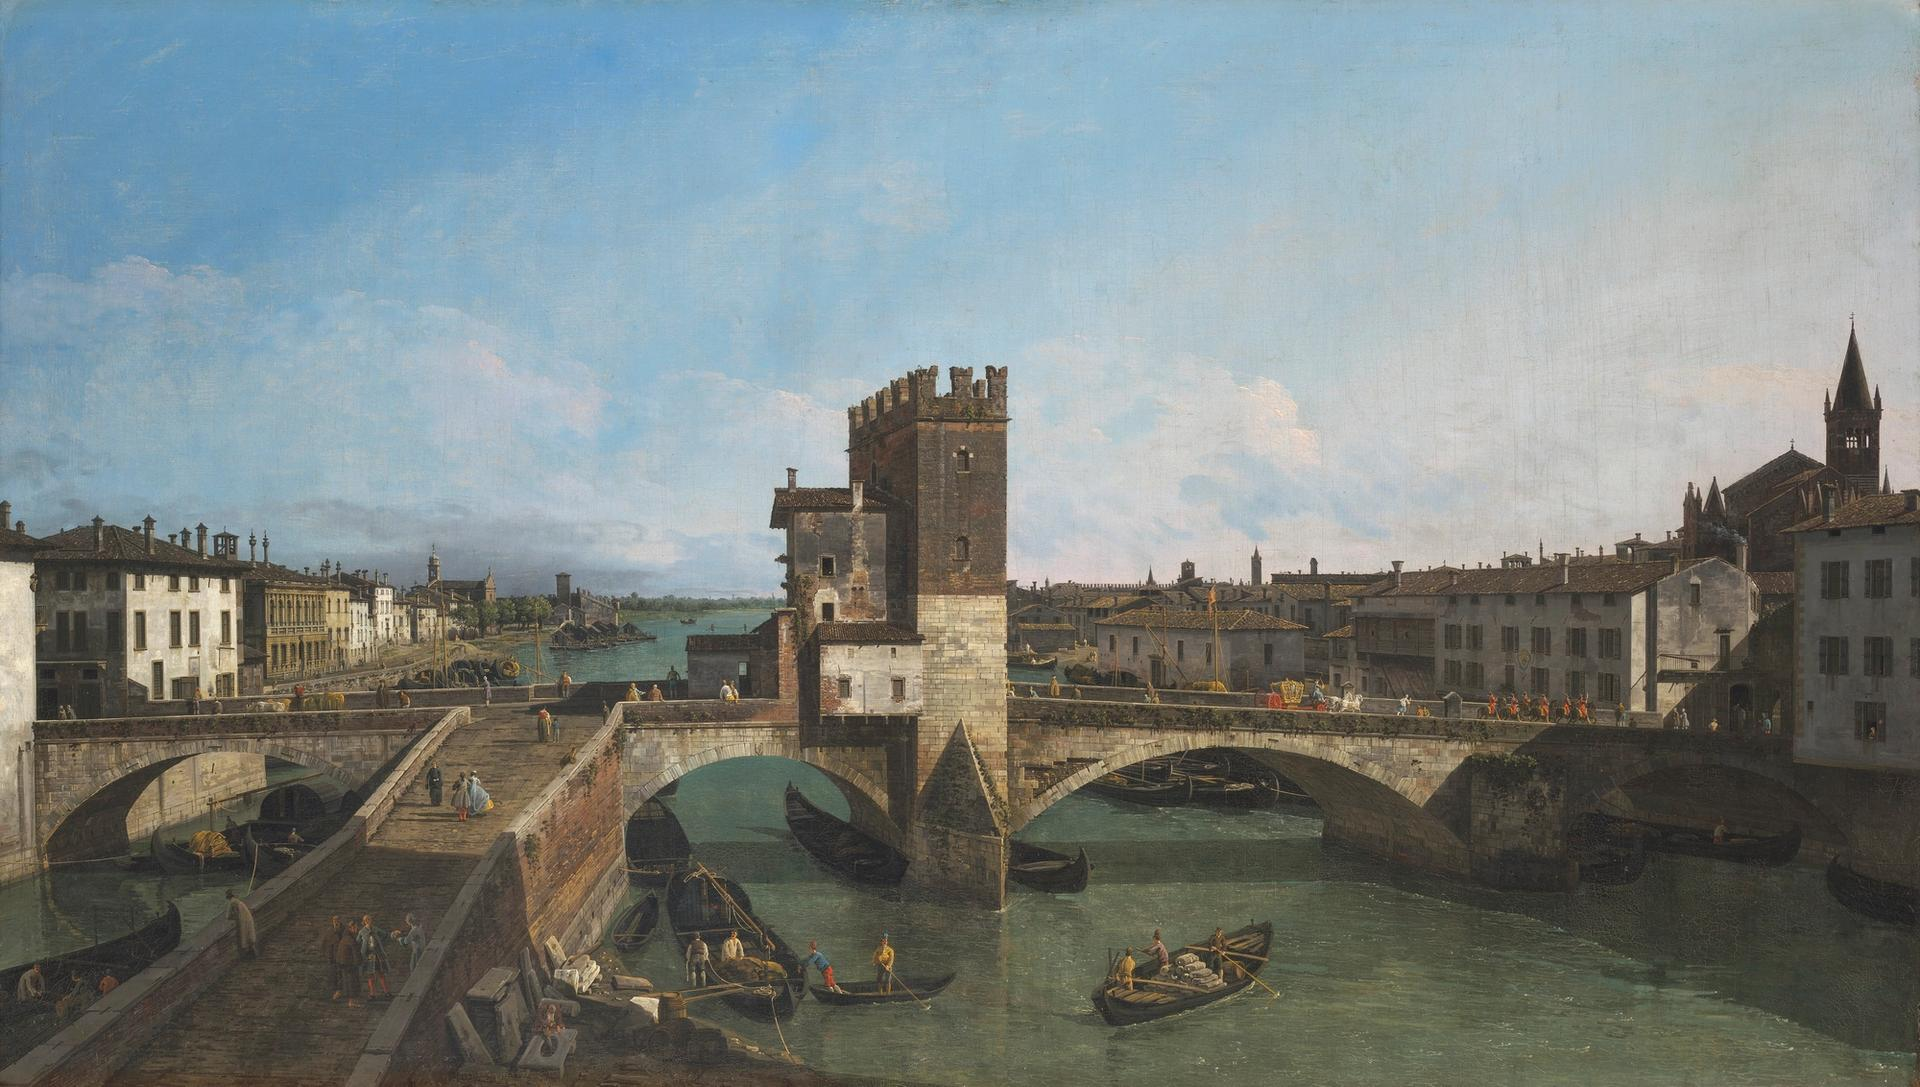 Bernardo Bellotto's View of Verona with the Ponte delle Navi Courtesy of Christie's